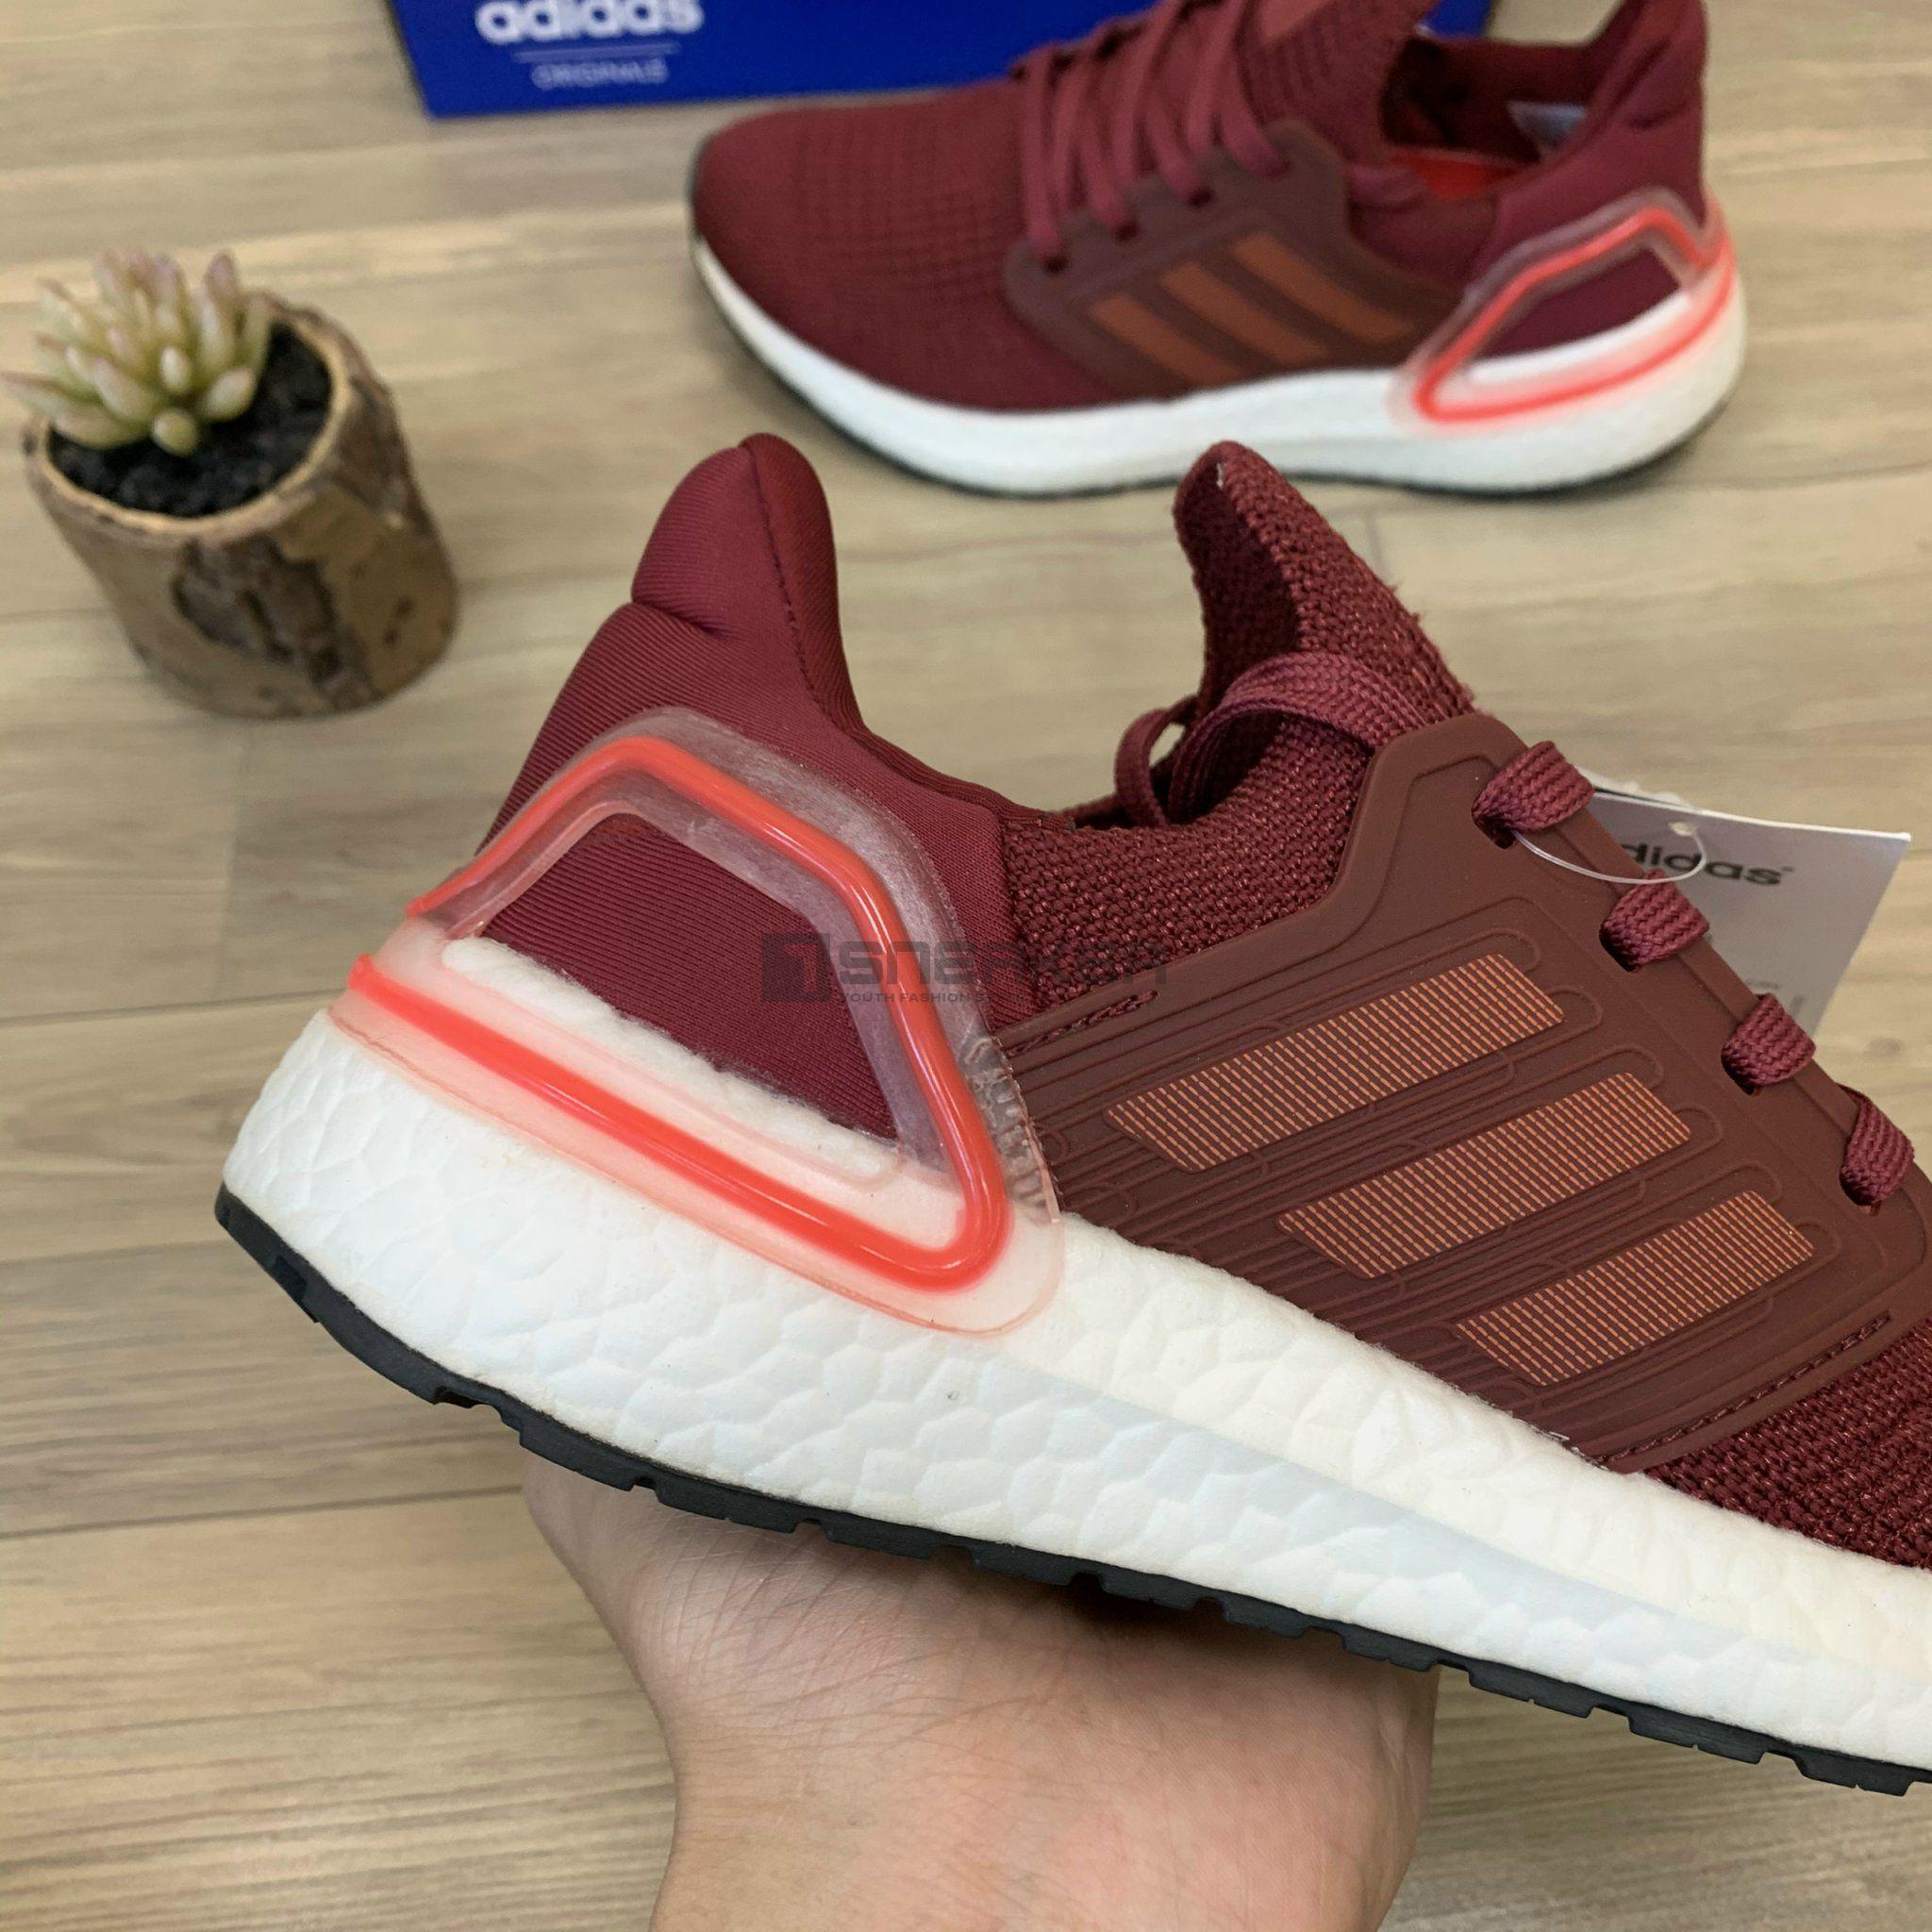 Giày Sneaker Ultraboost 6.0 đỏ mận replica 11 giá tốt tphcm